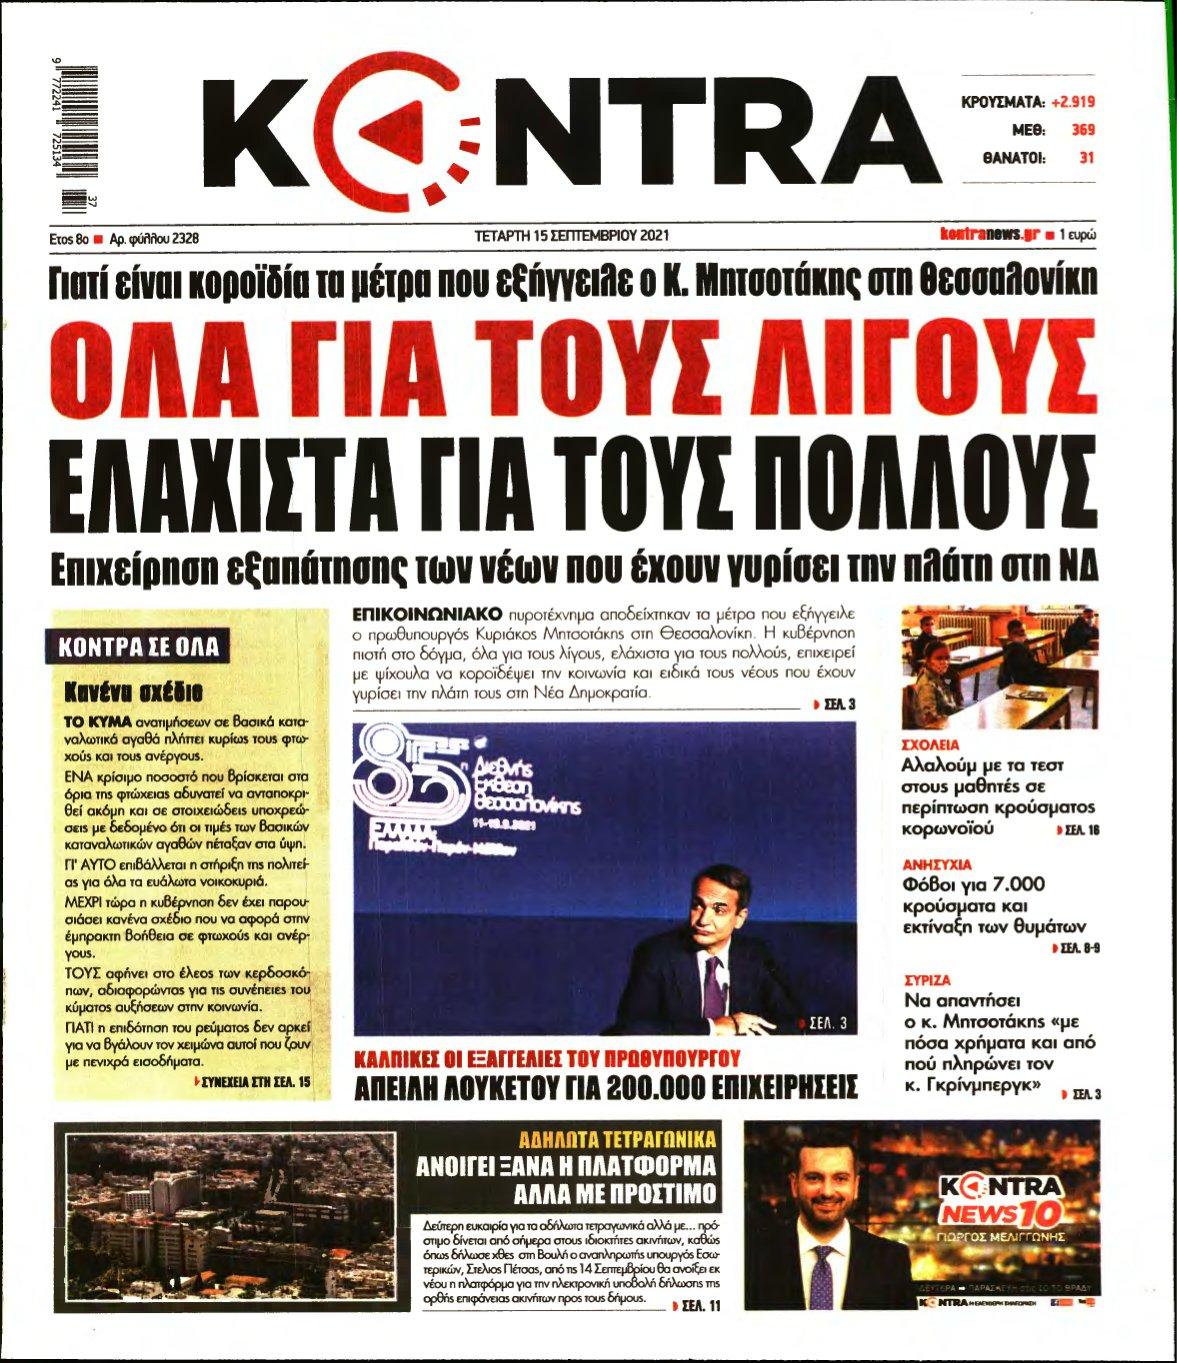 KONTRA NEWS – 15/09/2021